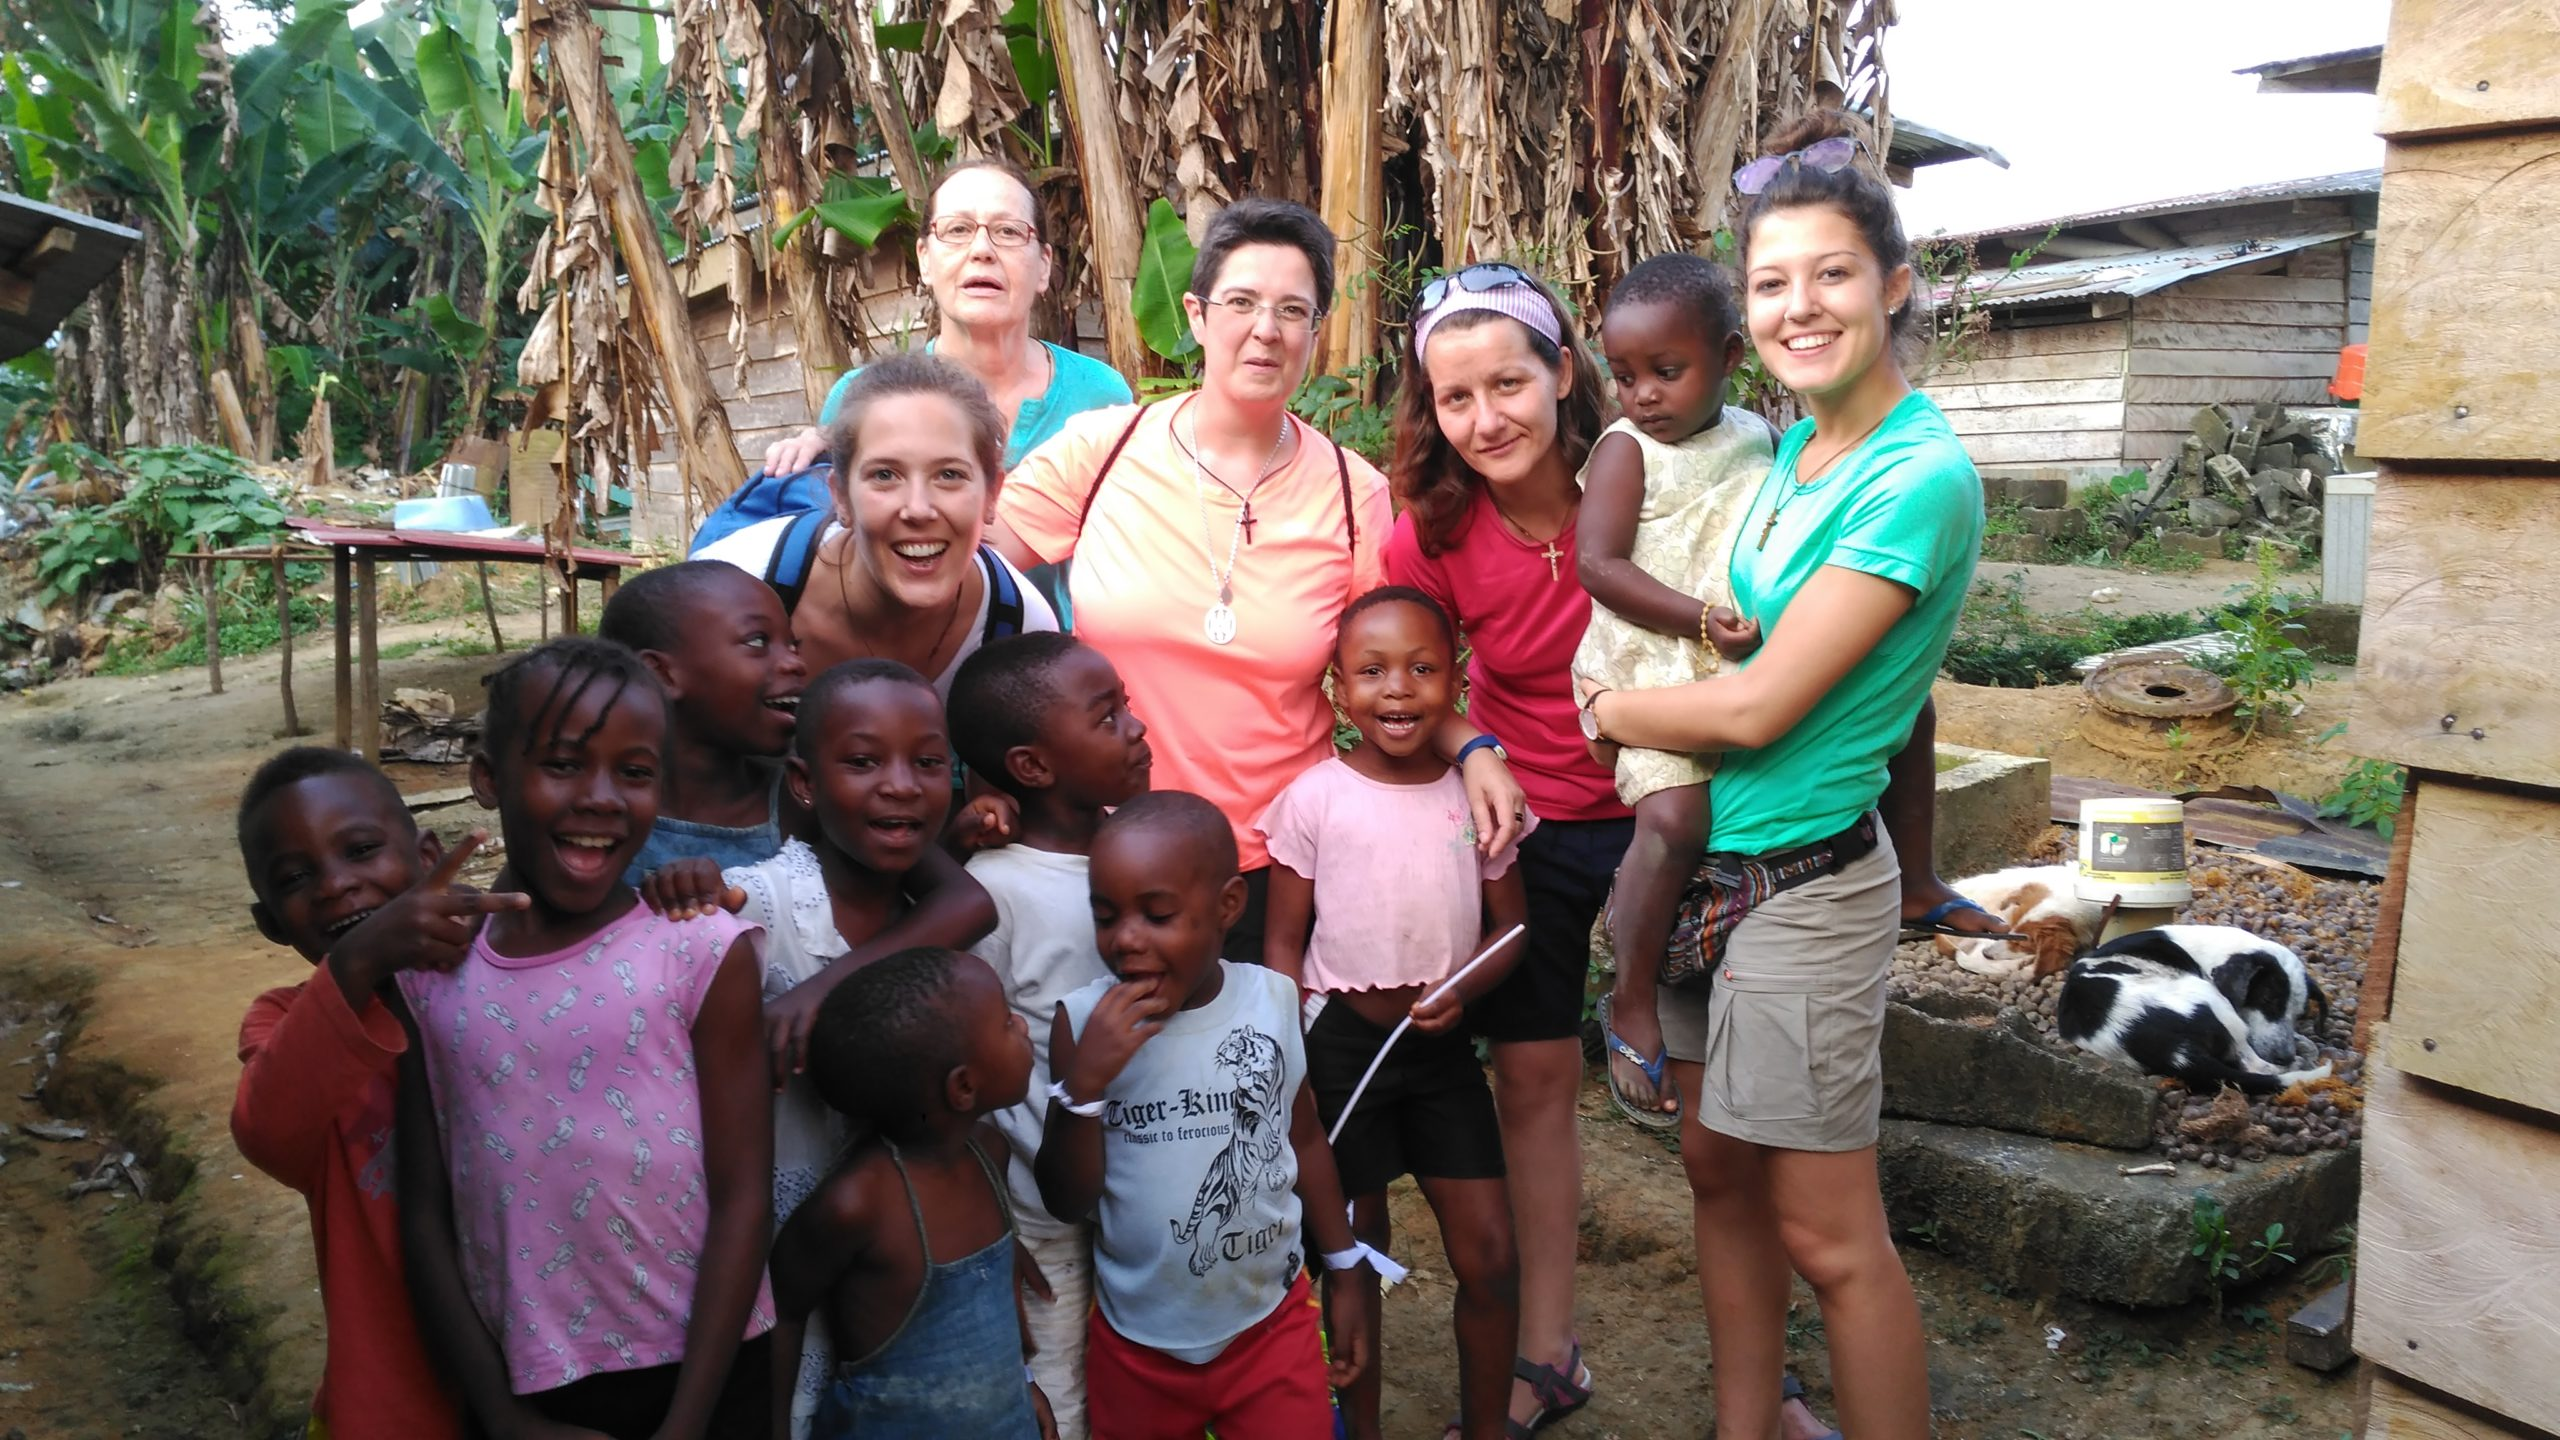 Galeria Voluntariado Misiones (1)